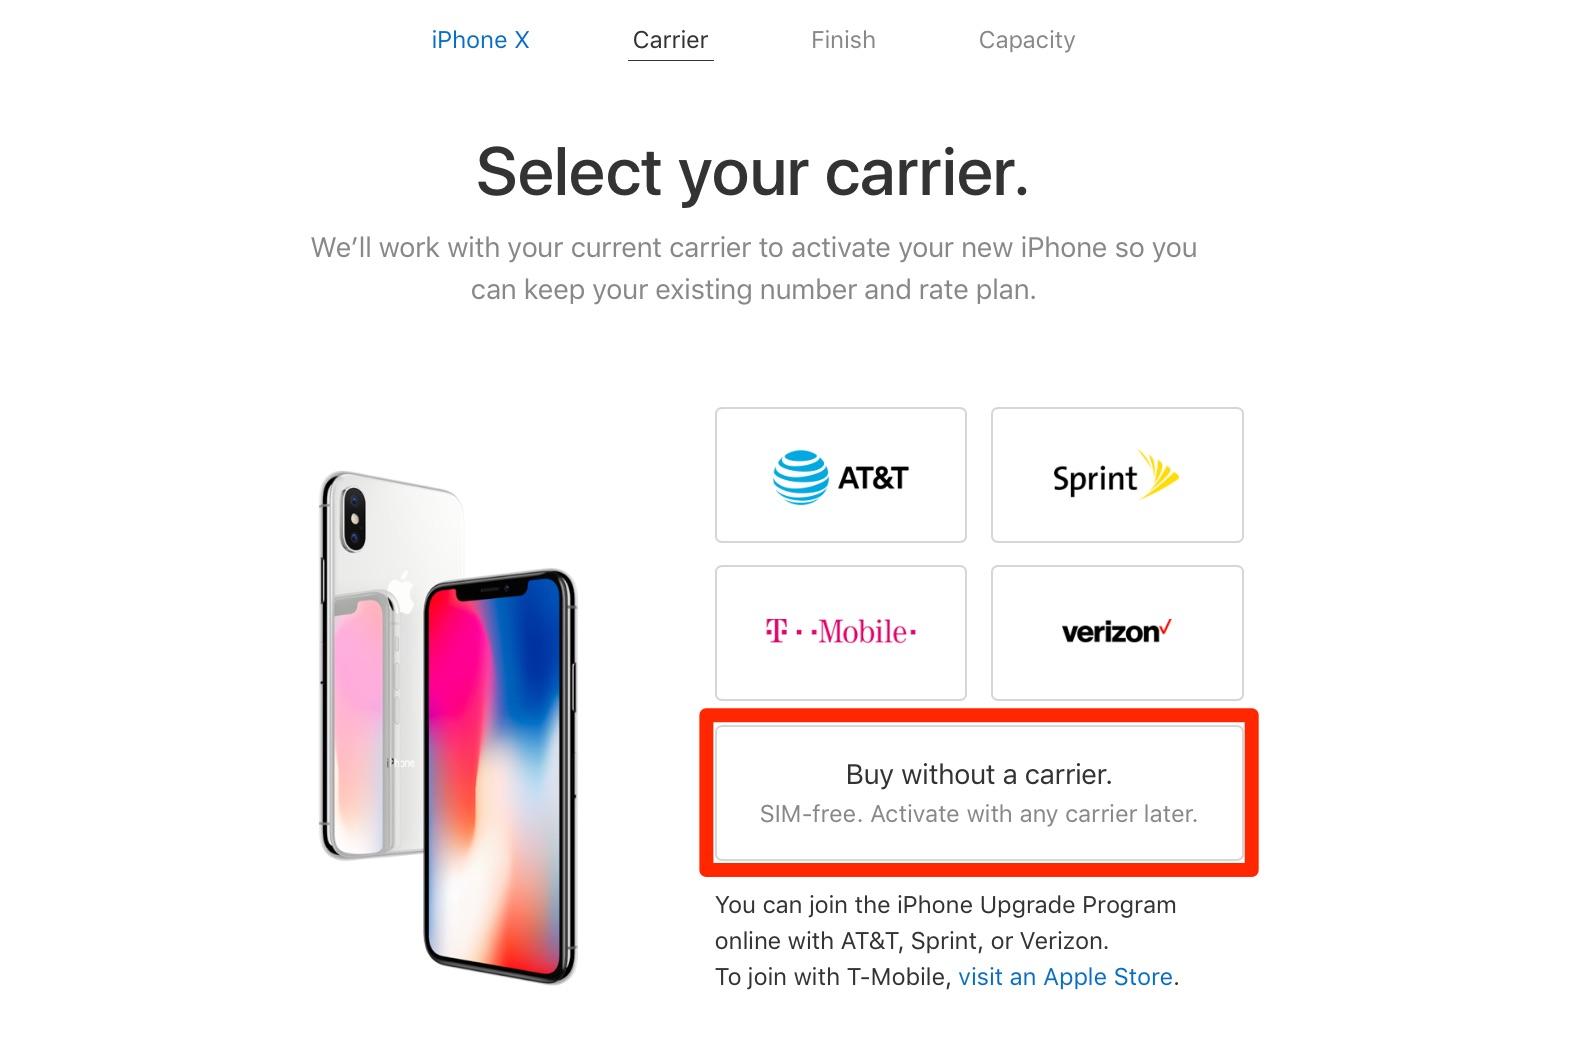 iphone x ohne vertragsbindung ab sofort ber den us apple online store verf gbar kein sim lock. Black Bedroom Furniture Sets. Home Design Ideas